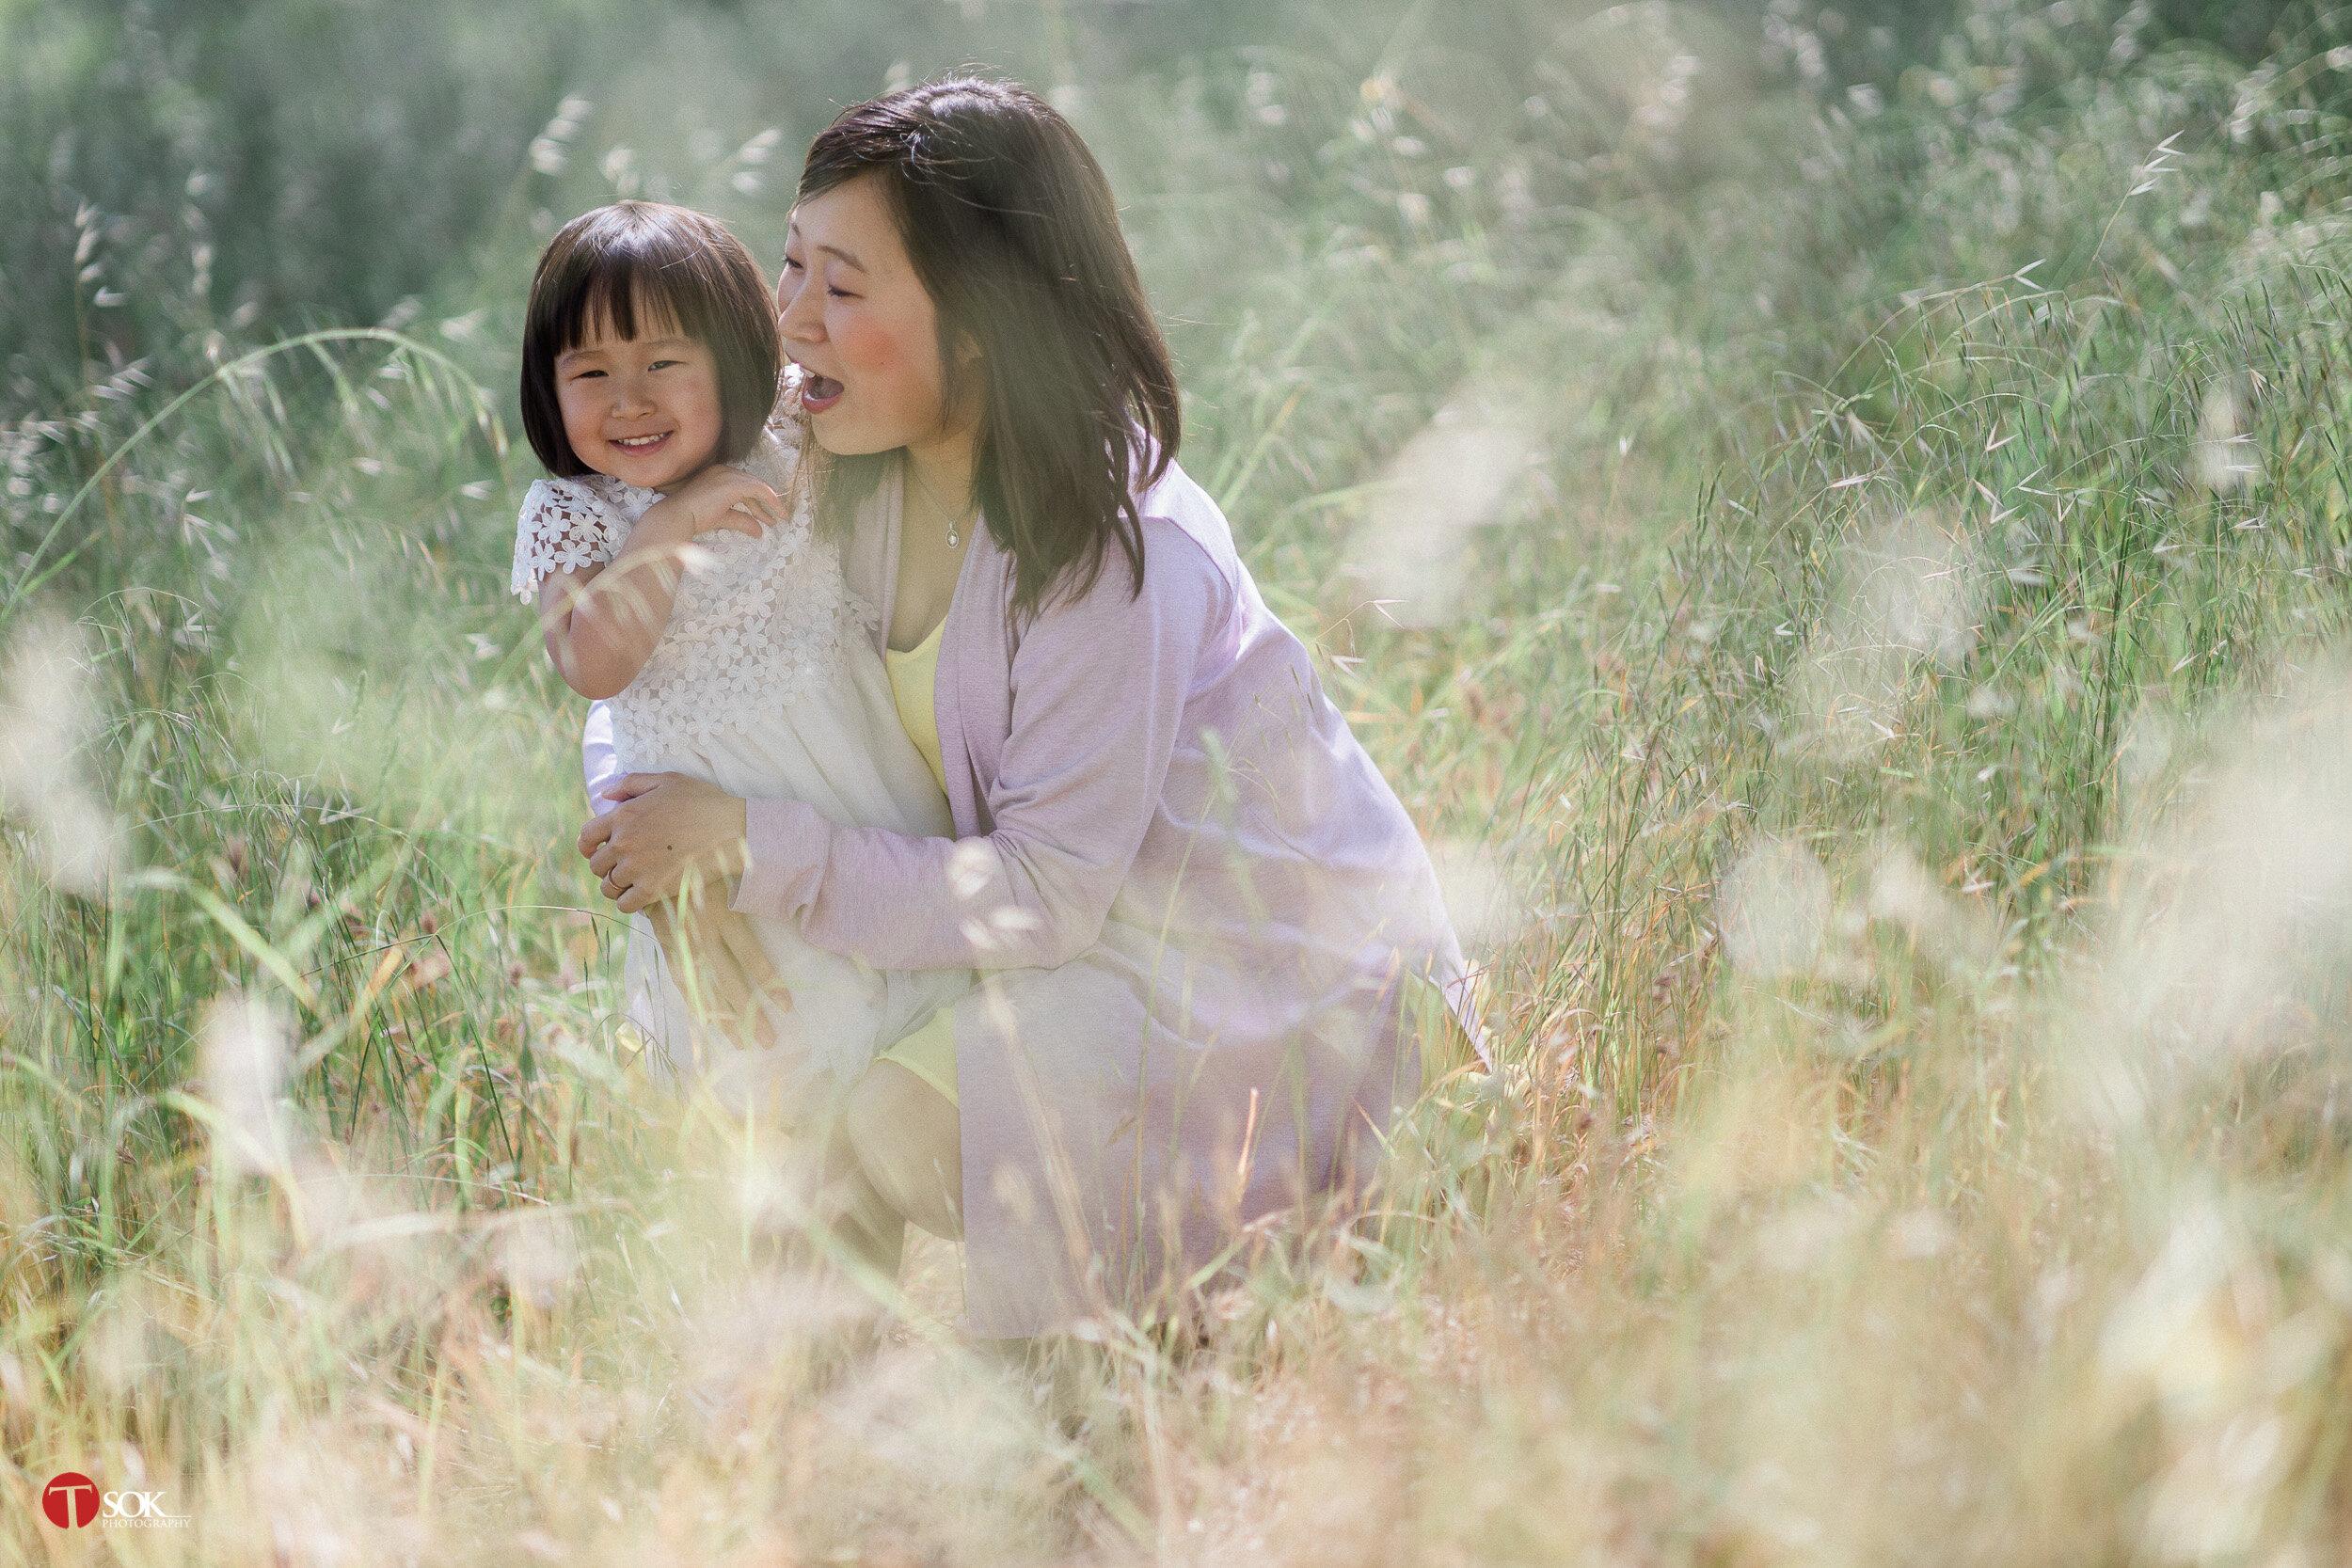 20190504_0005_yuen_maternity_baylands_park.jpg